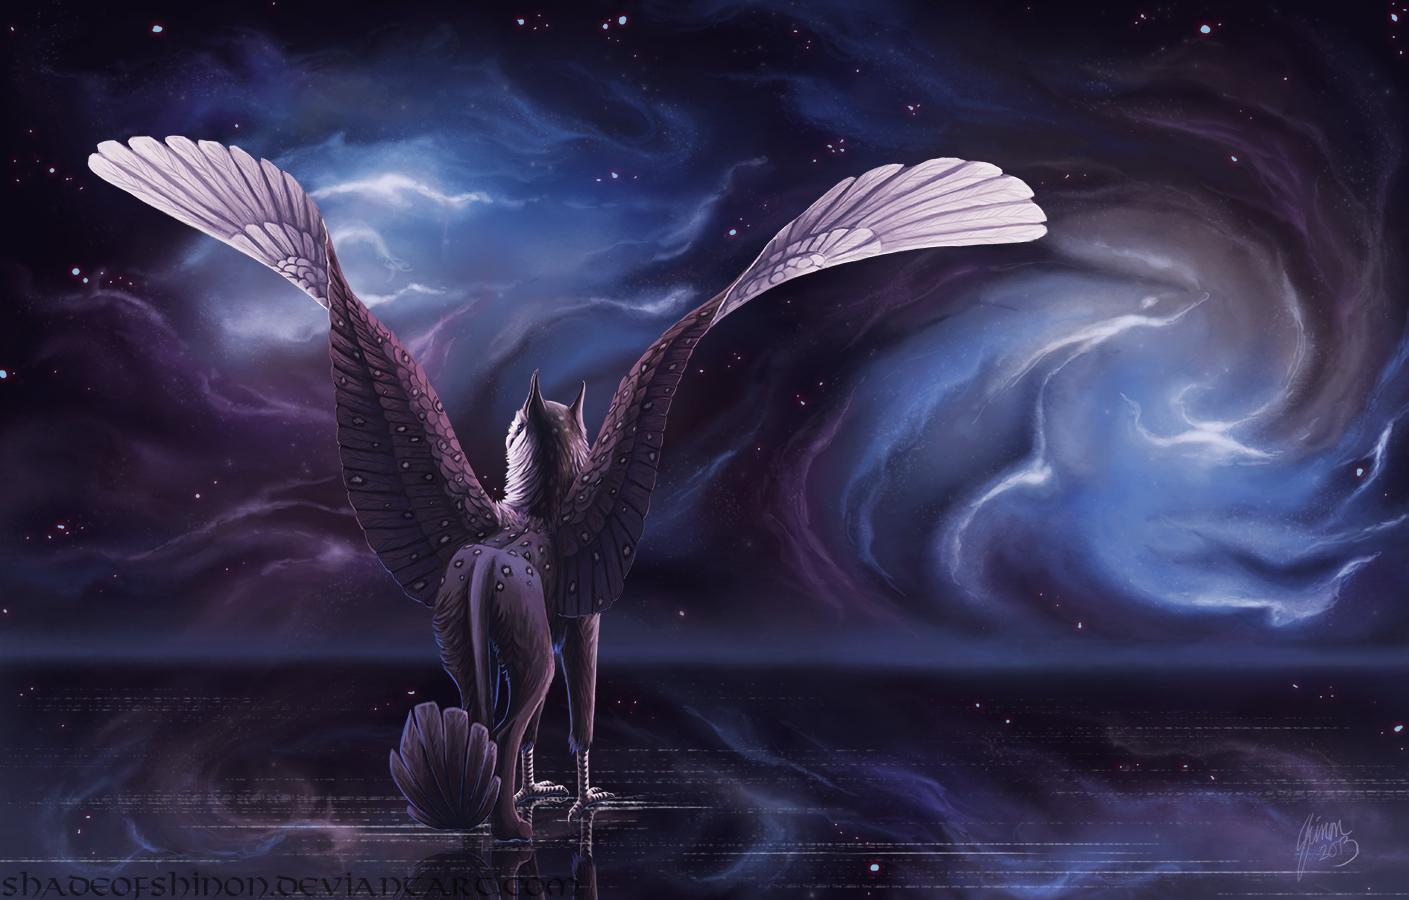 Waiting Between Worlds by ShadeofShinon